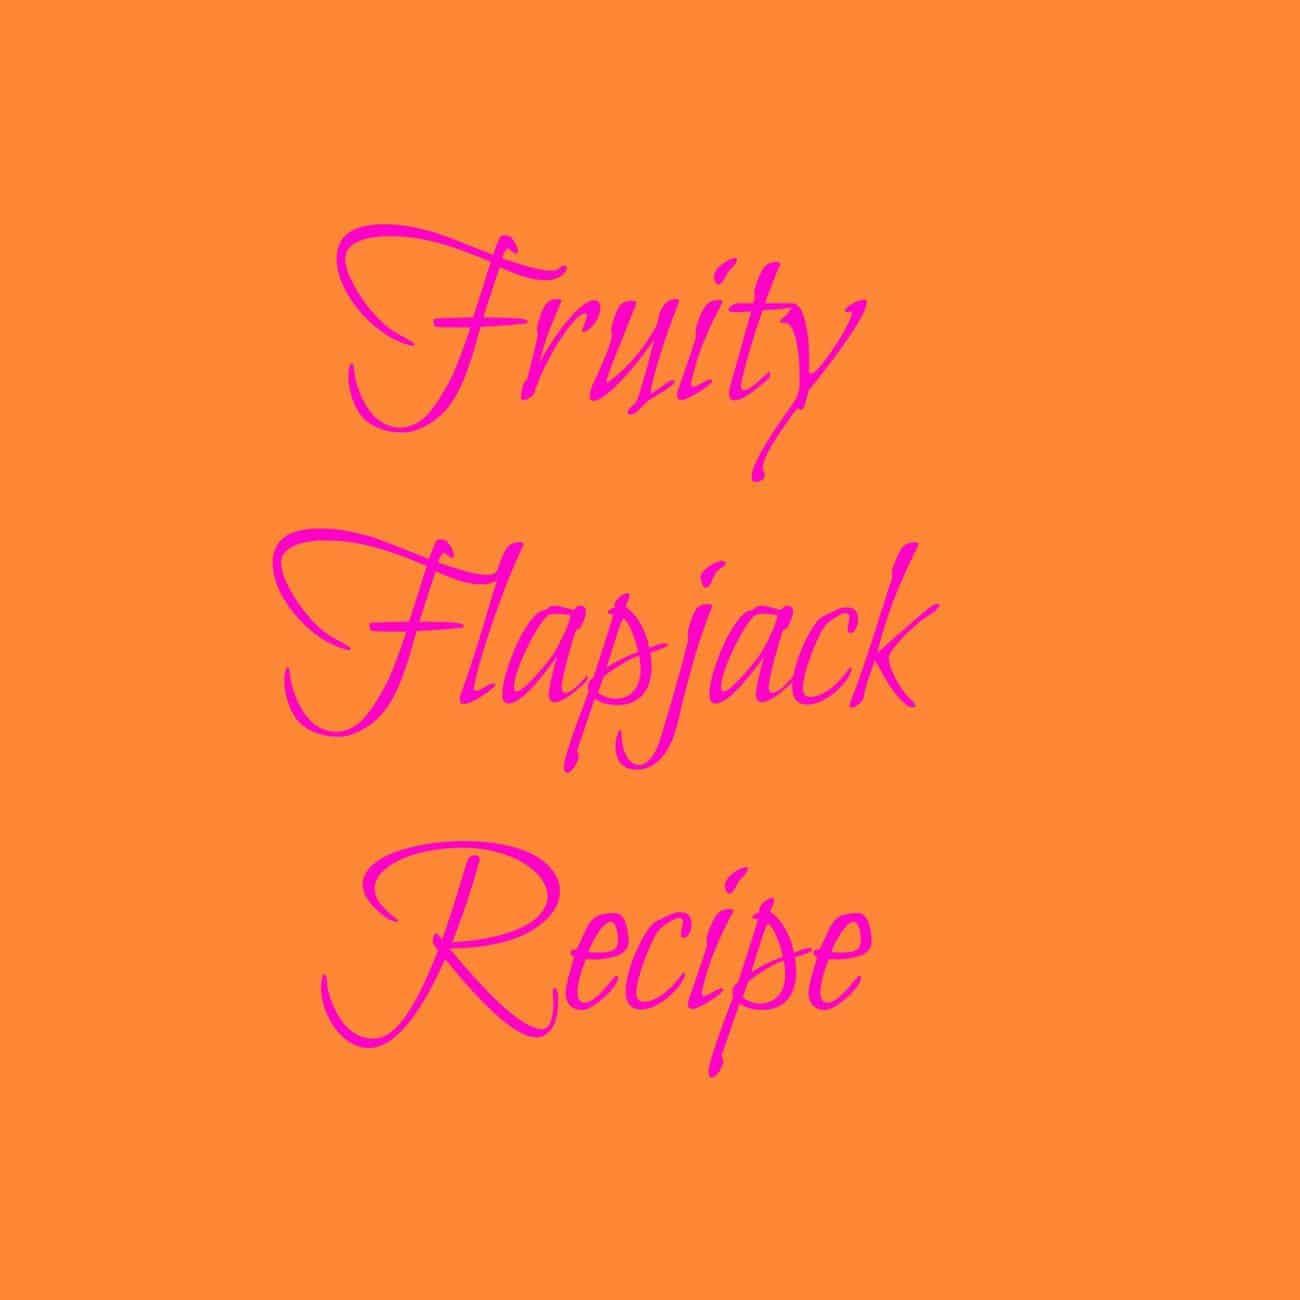 fruity flapjack recipe